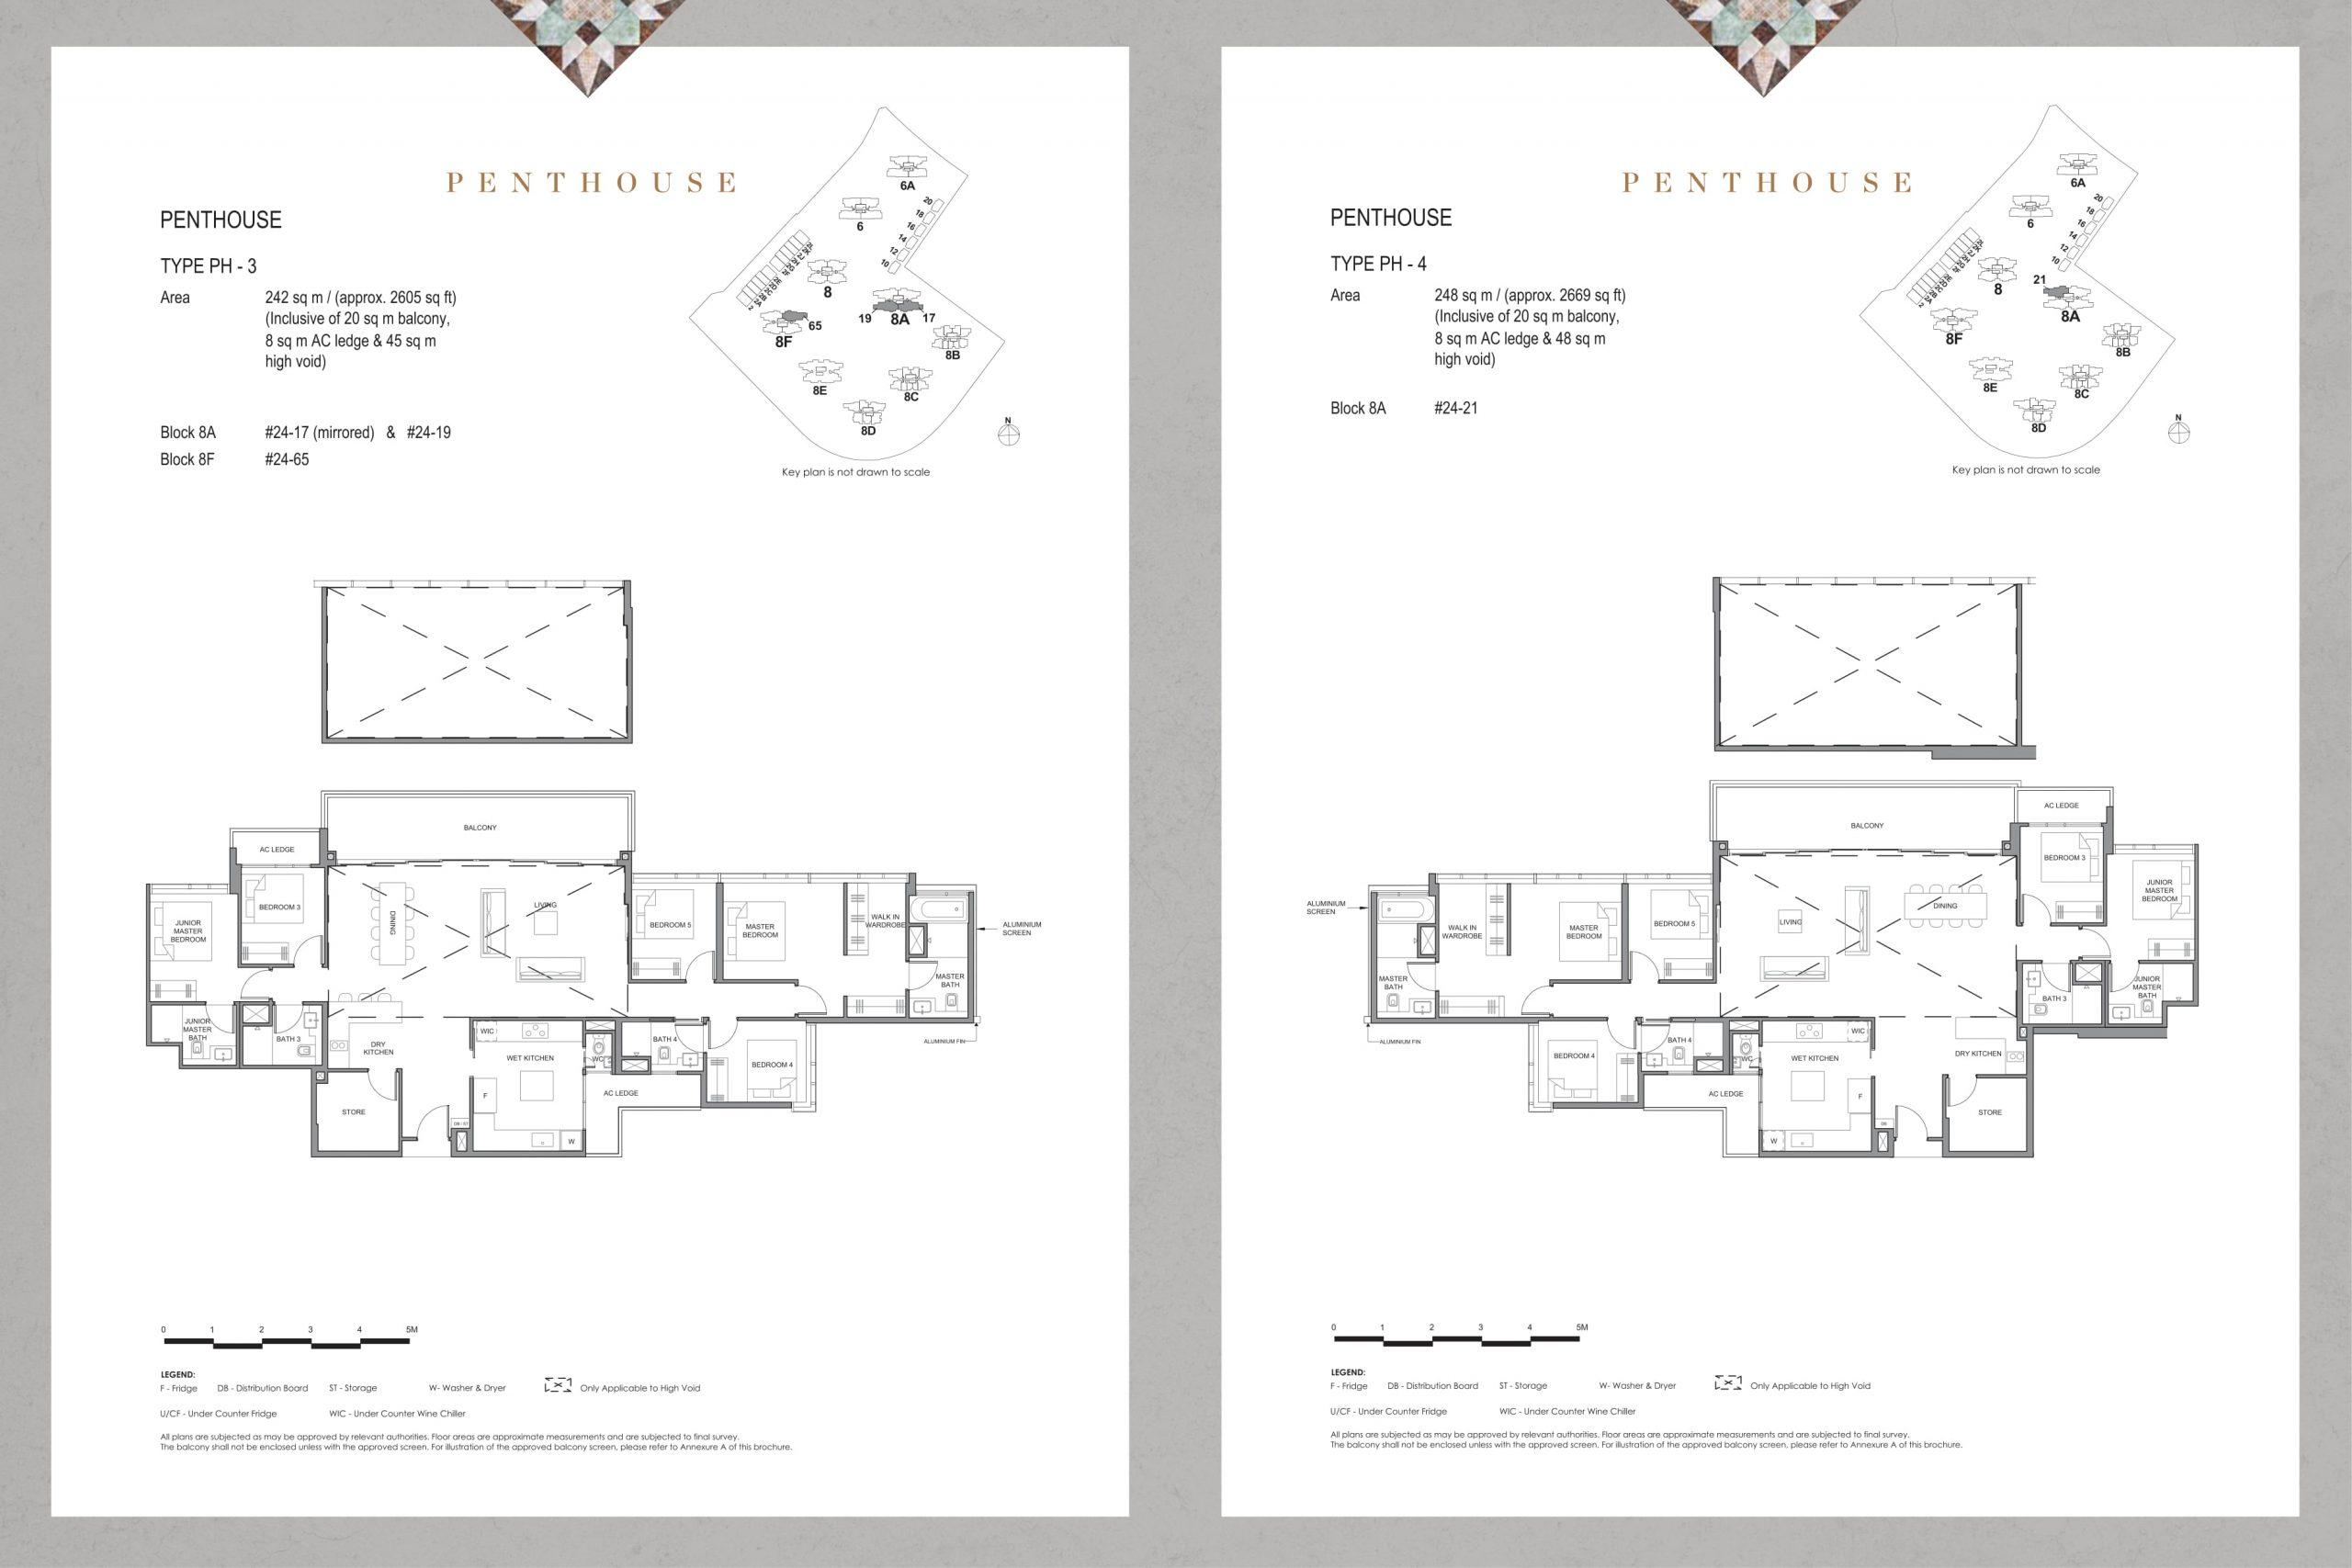 Parc Clematis' elegance penthouse types